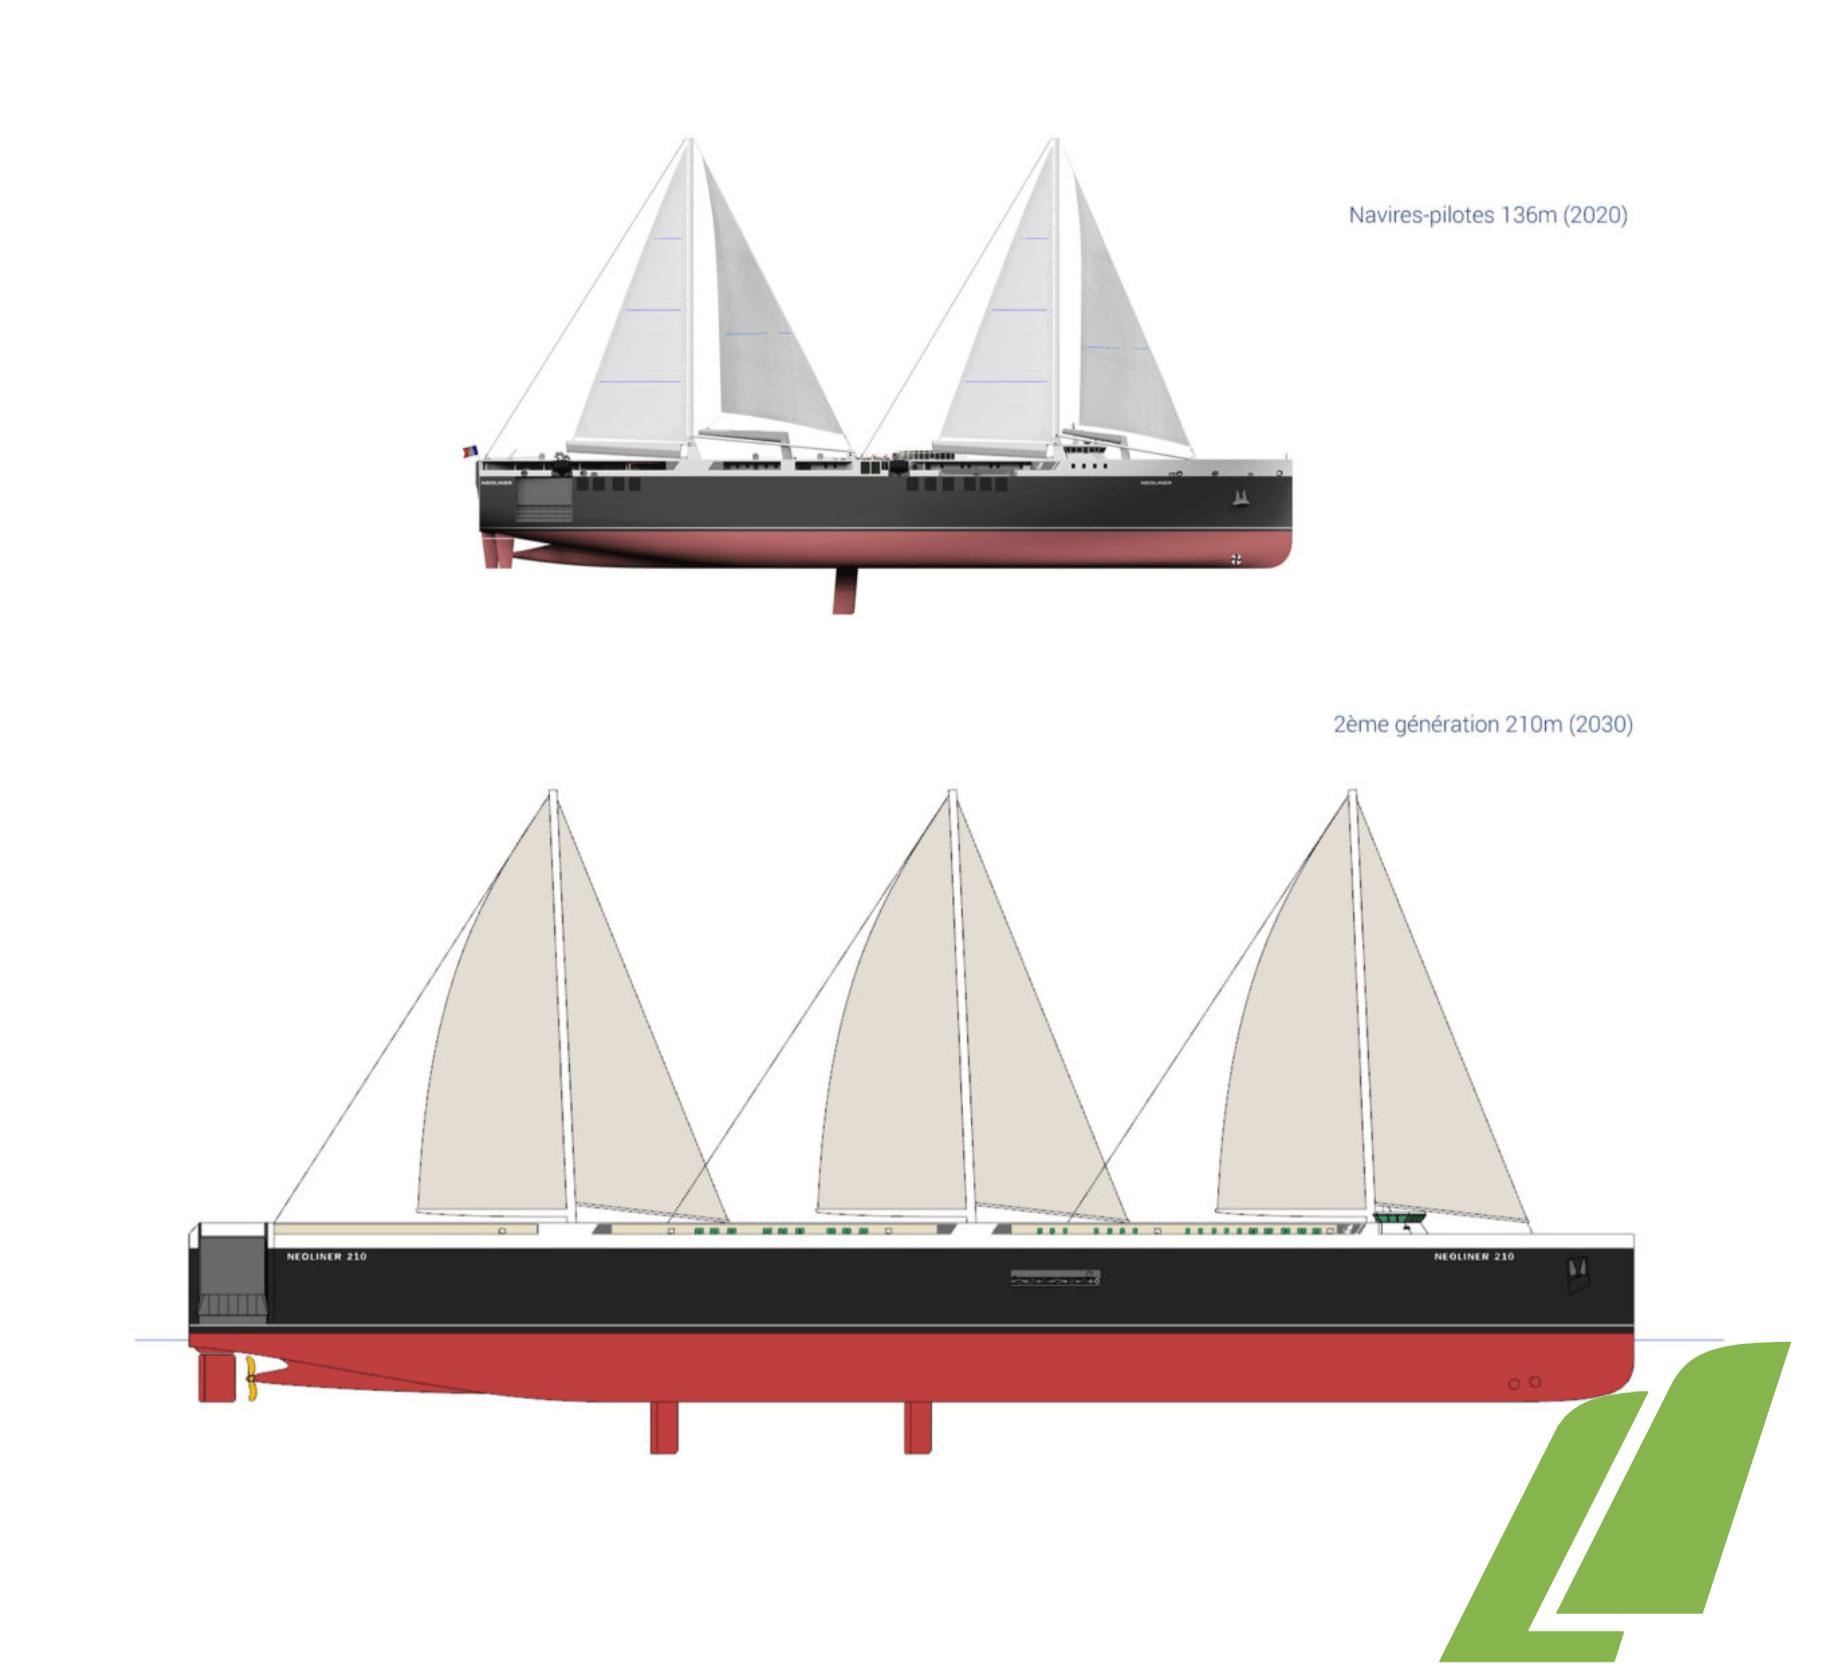 ship design development